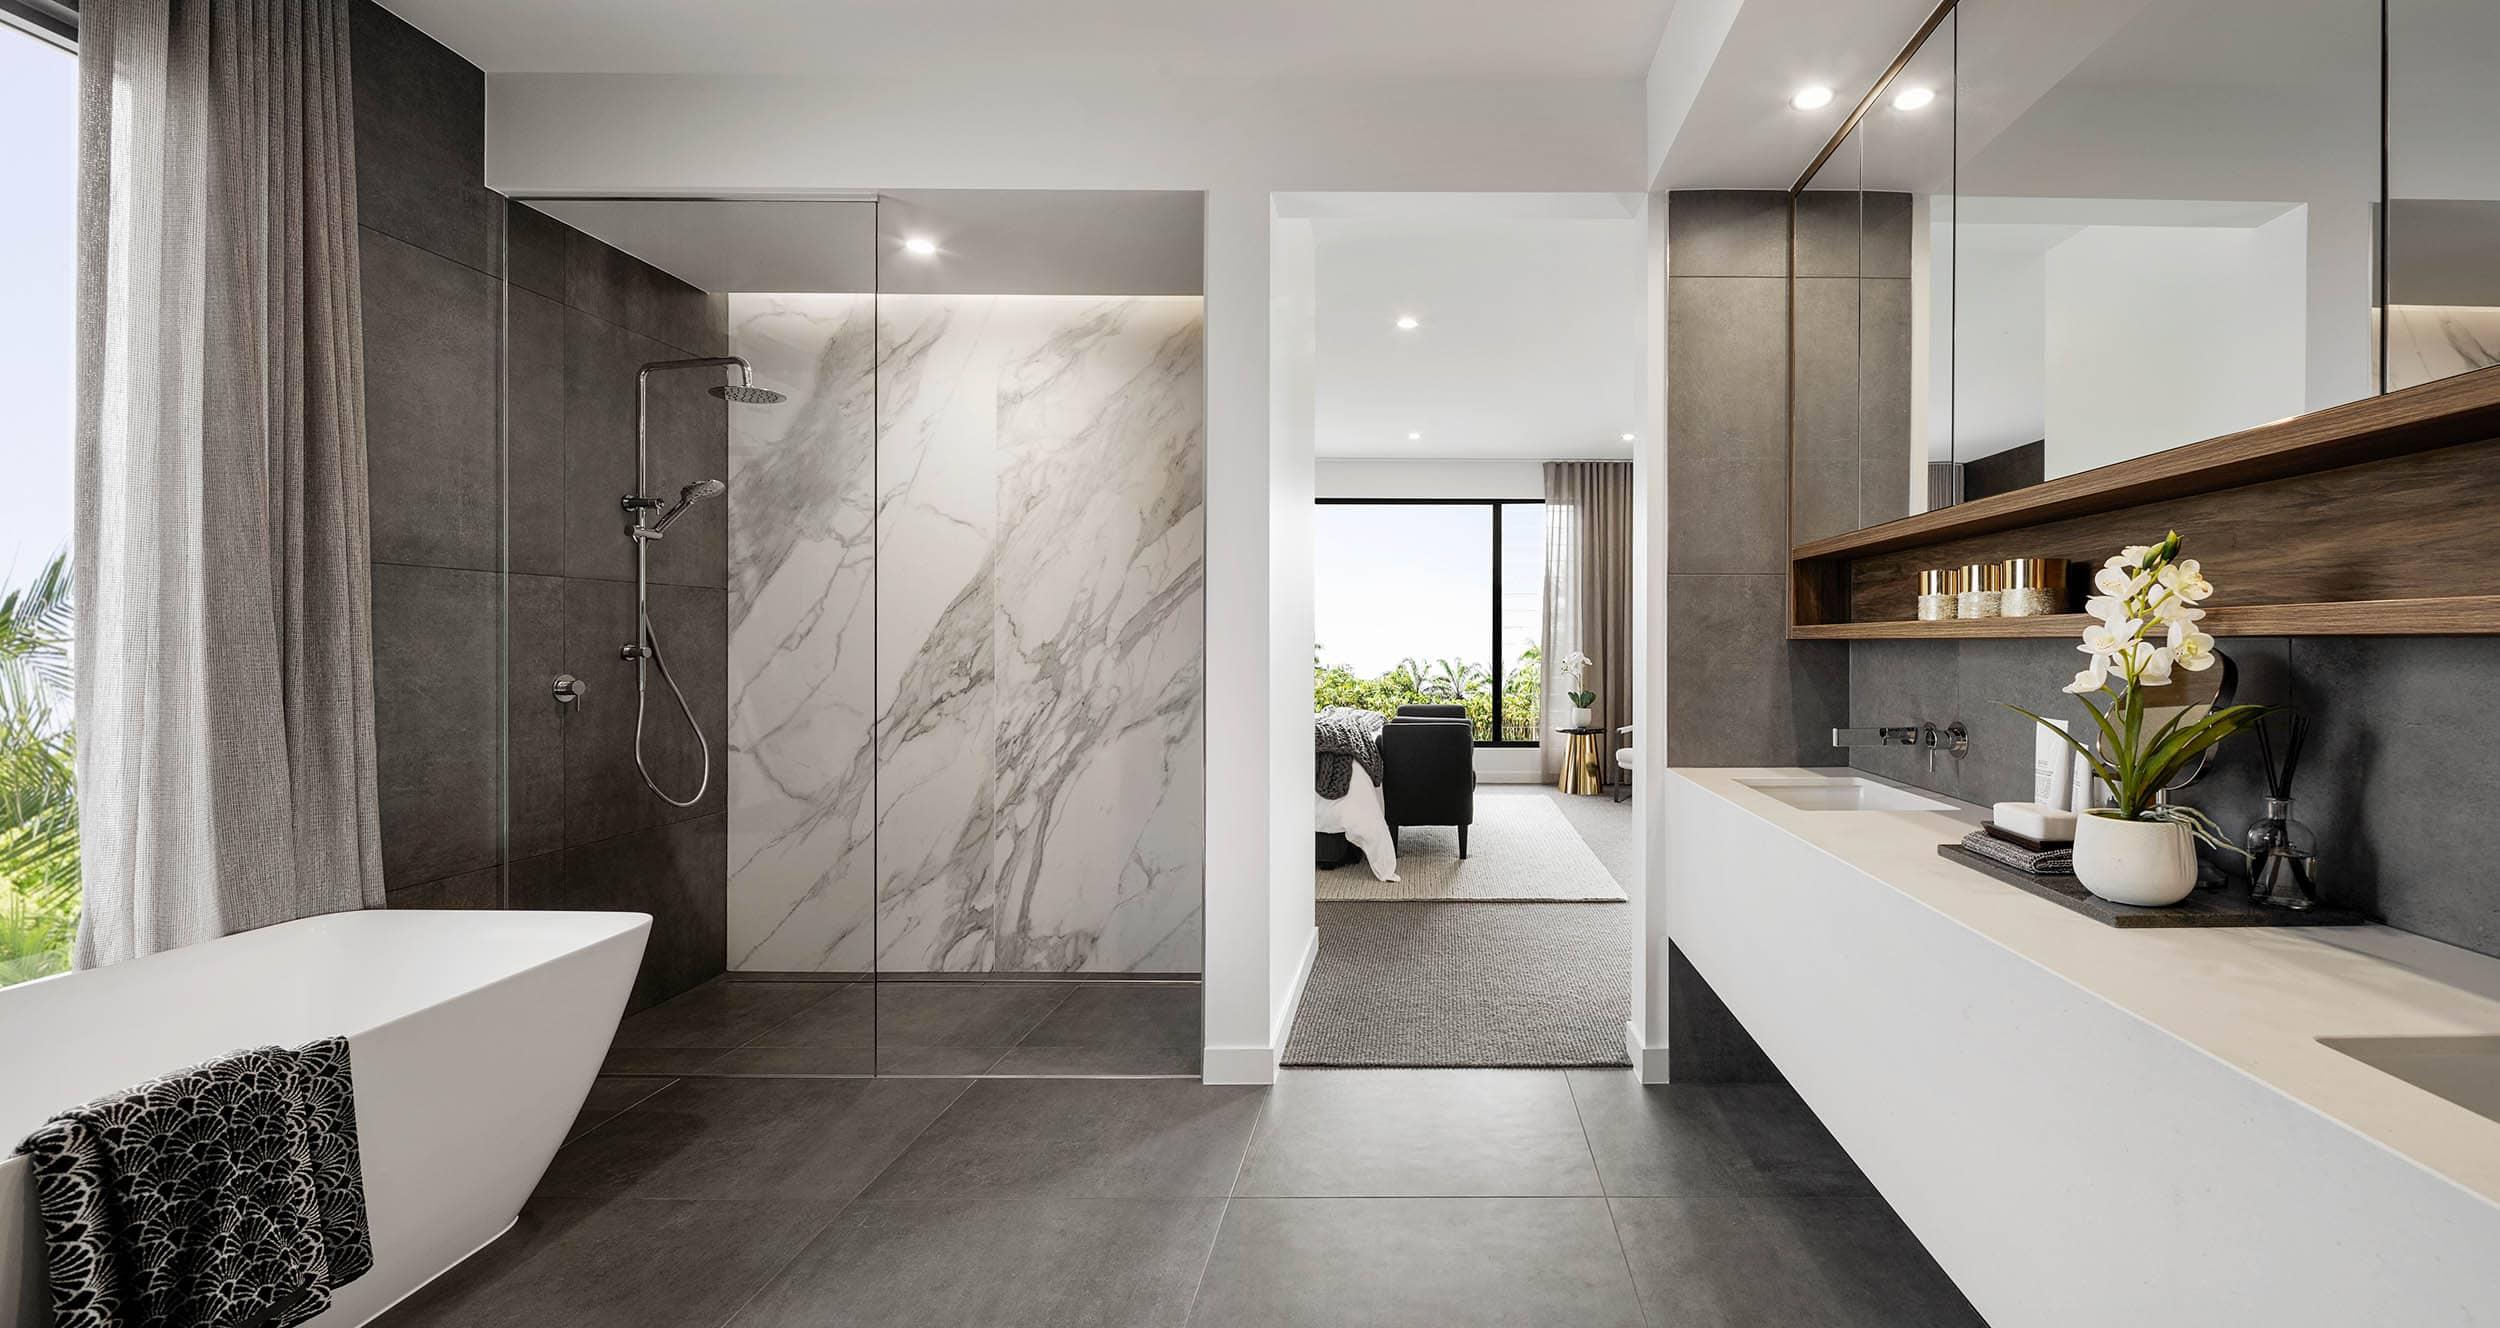 marble vein feature wall in dark moody bathroom with grey floor tiles